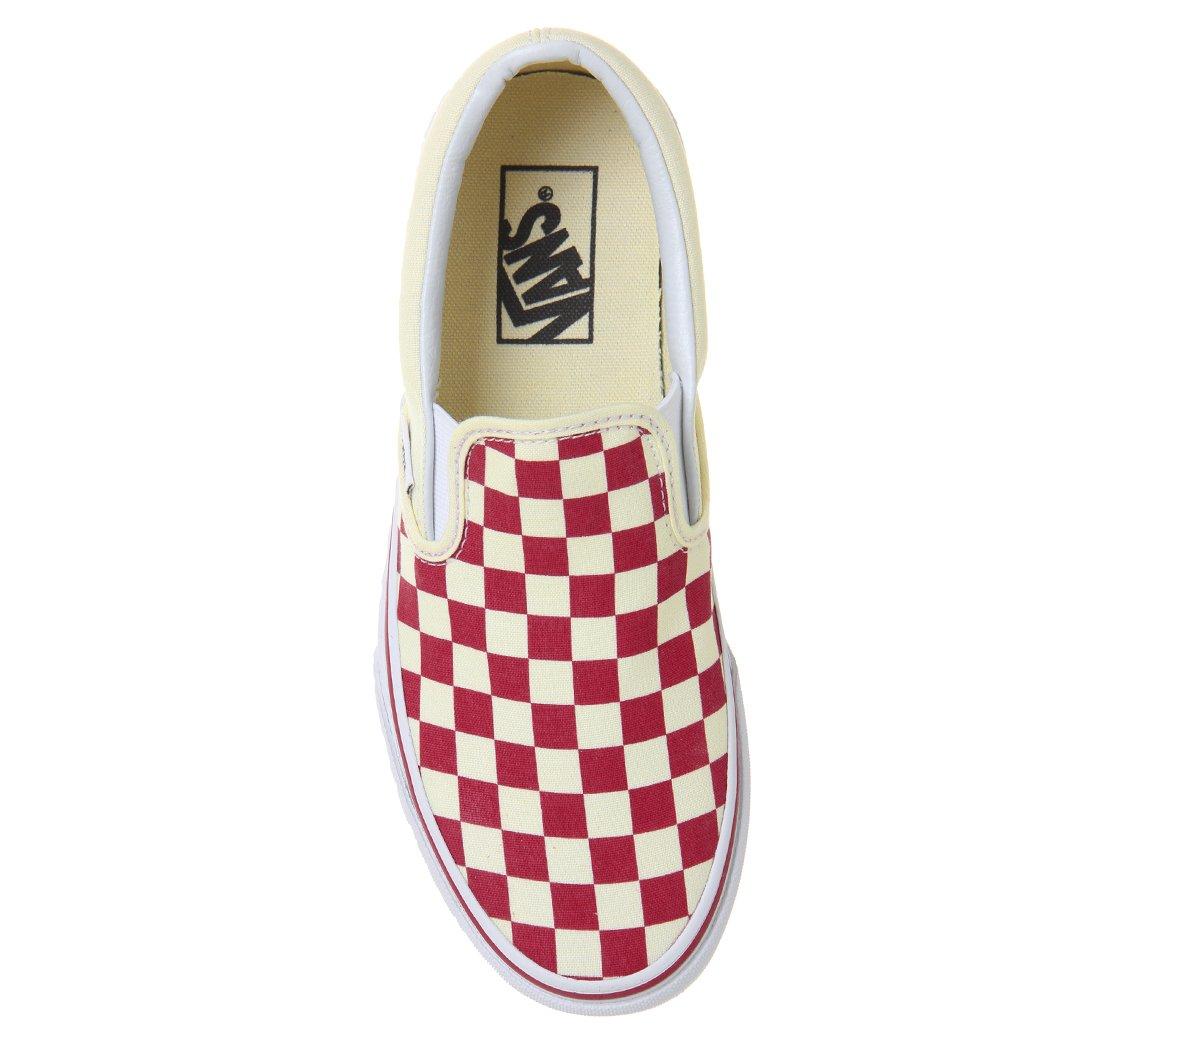 Vans Unisex Classic (Checkerboard) Slip-On Skate Shoe B07B4RTVYL 5 M US Women / 3.5 M US Men|(Checker) Racing Red / White